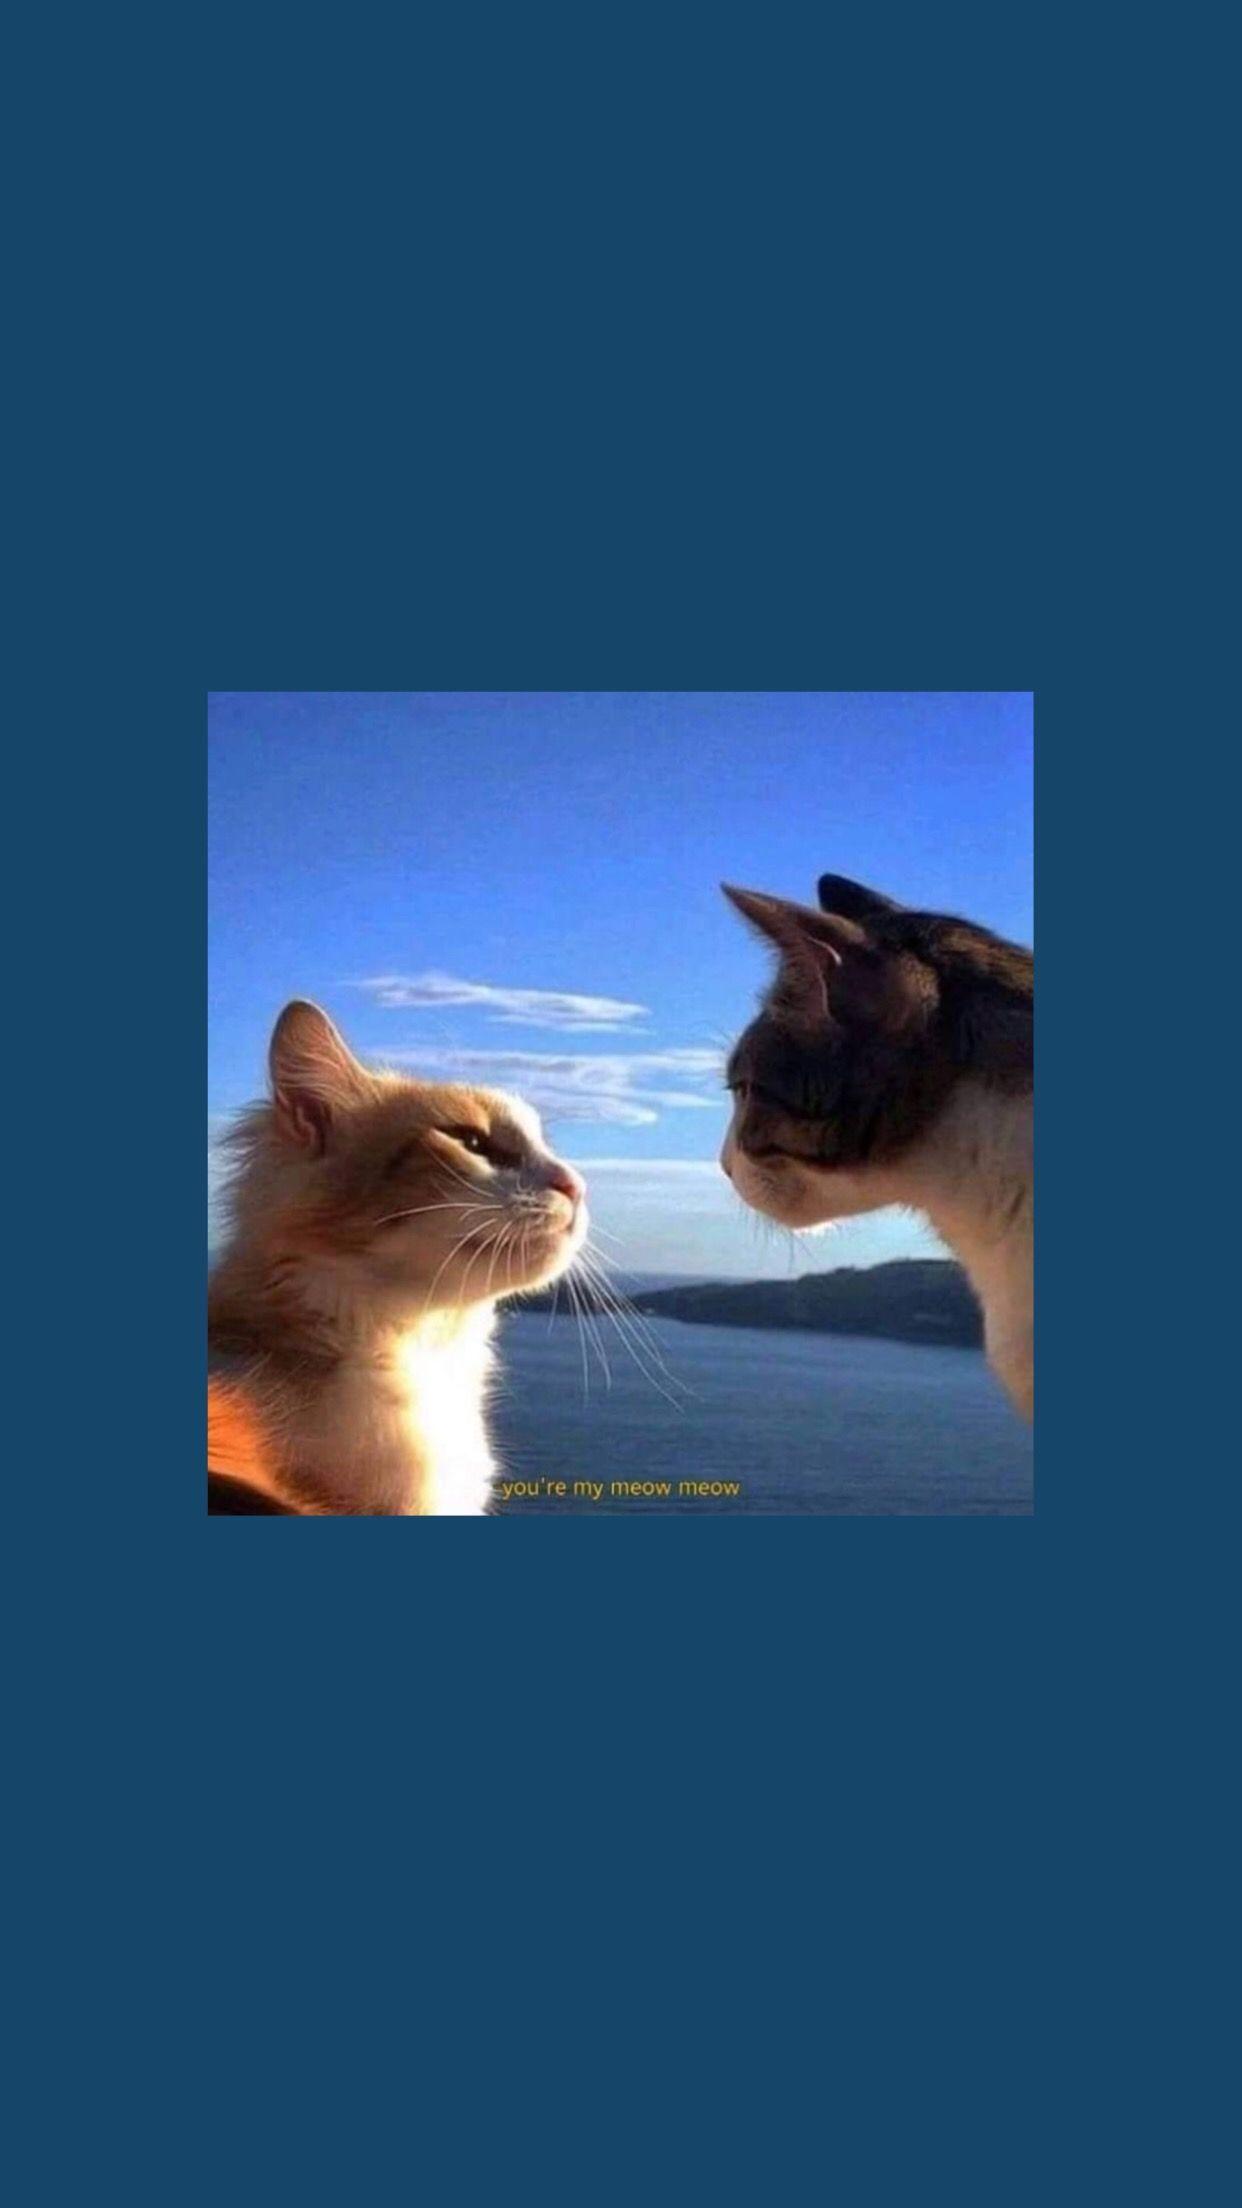 meow meow -  aesthetic wallpaper ✿ #wallpaper #phone #lockscreen #aesthetic #cats  - #allergictocats #catcat #cattattoo #catwallpaper #catsandkittens #crazycats #dogcat #MEOW #petscats